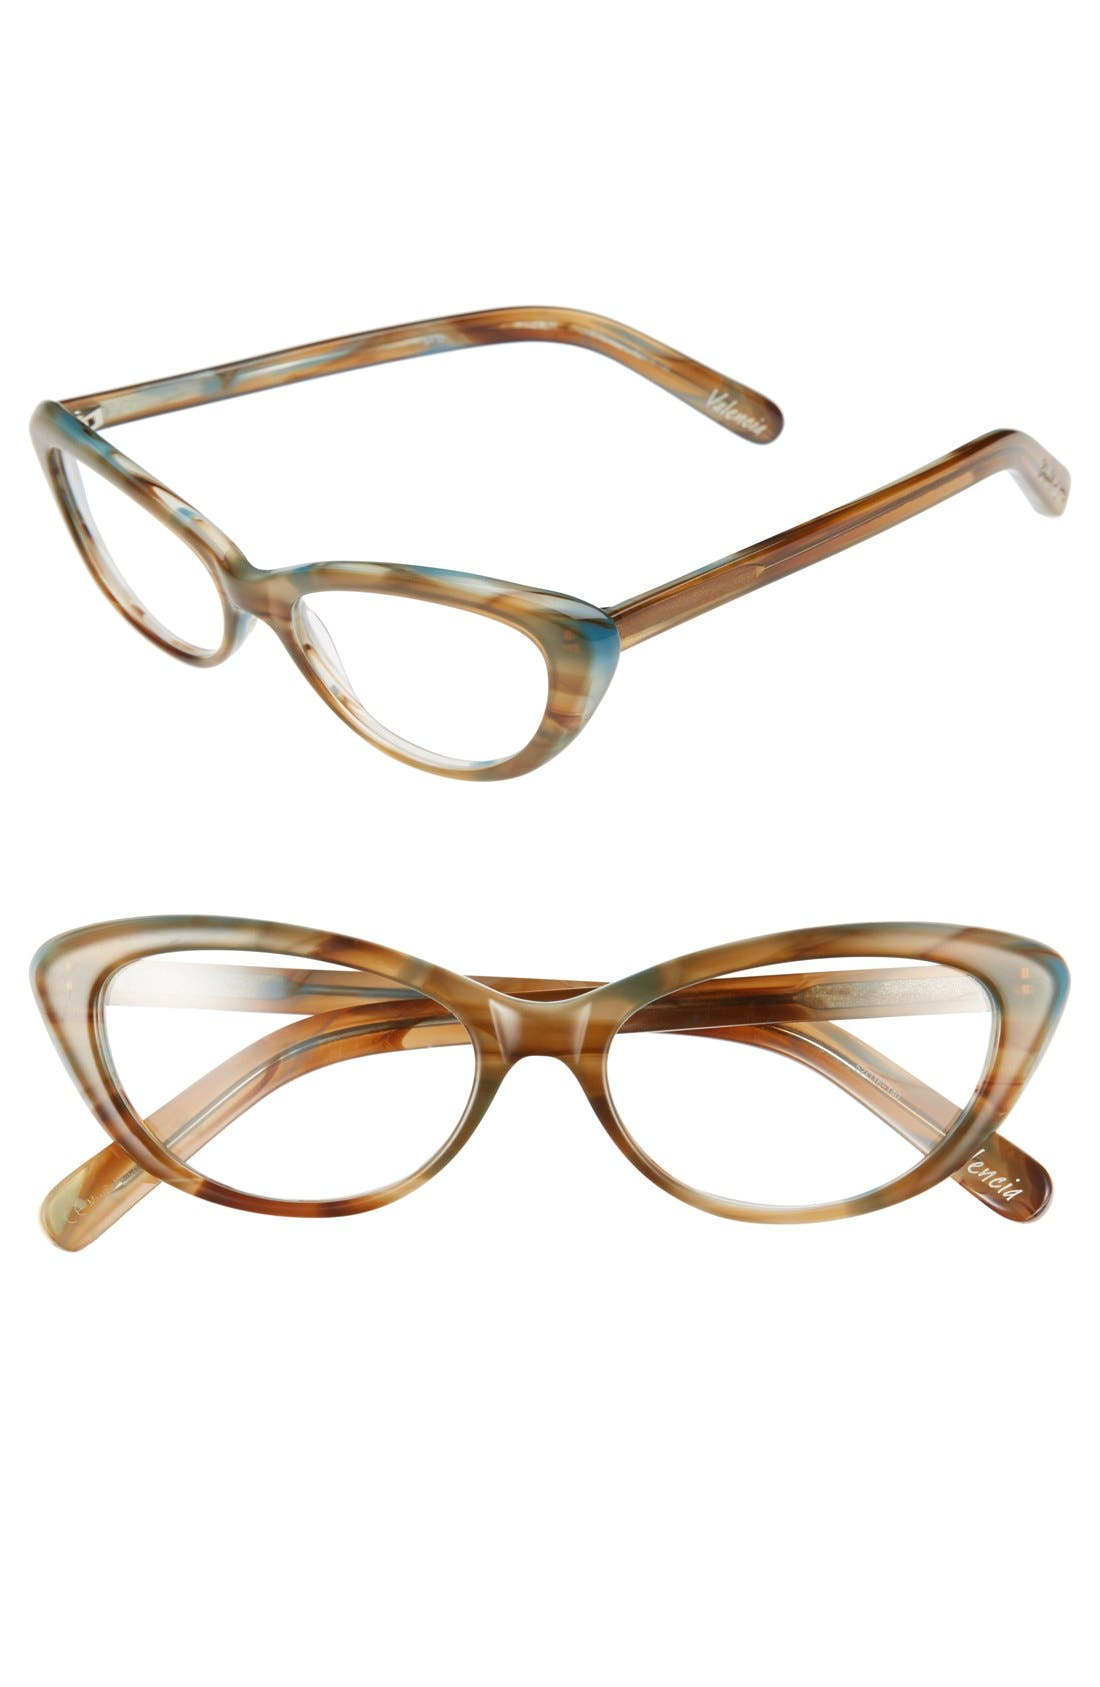 Alternate Image 1 Selected - Elizabeth and James 'Valencia' 52mm Optical Glasses